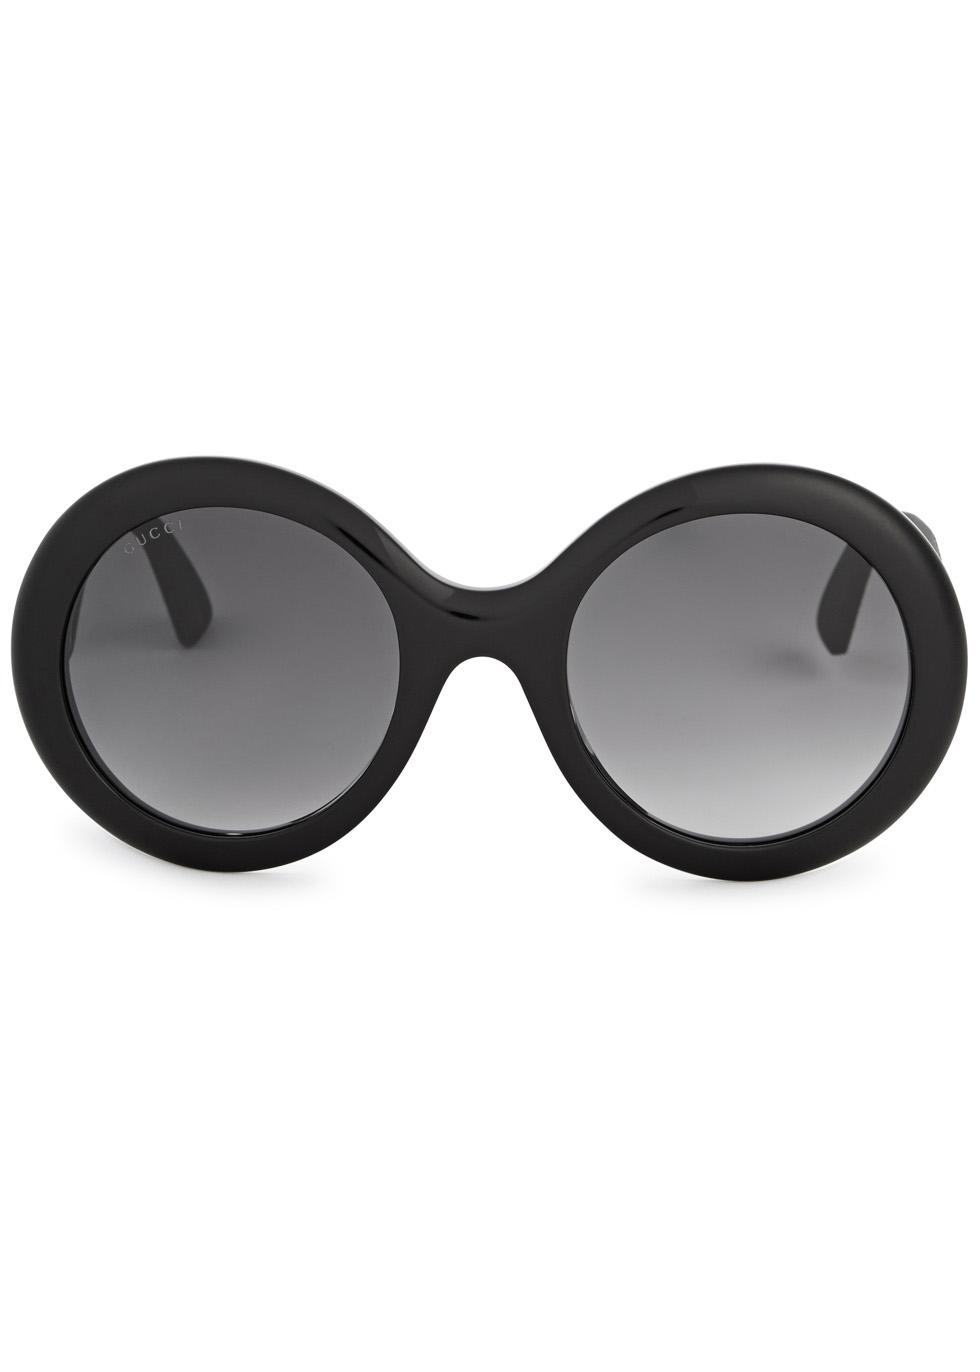 Black glittered oversized sunglasses - Gucci